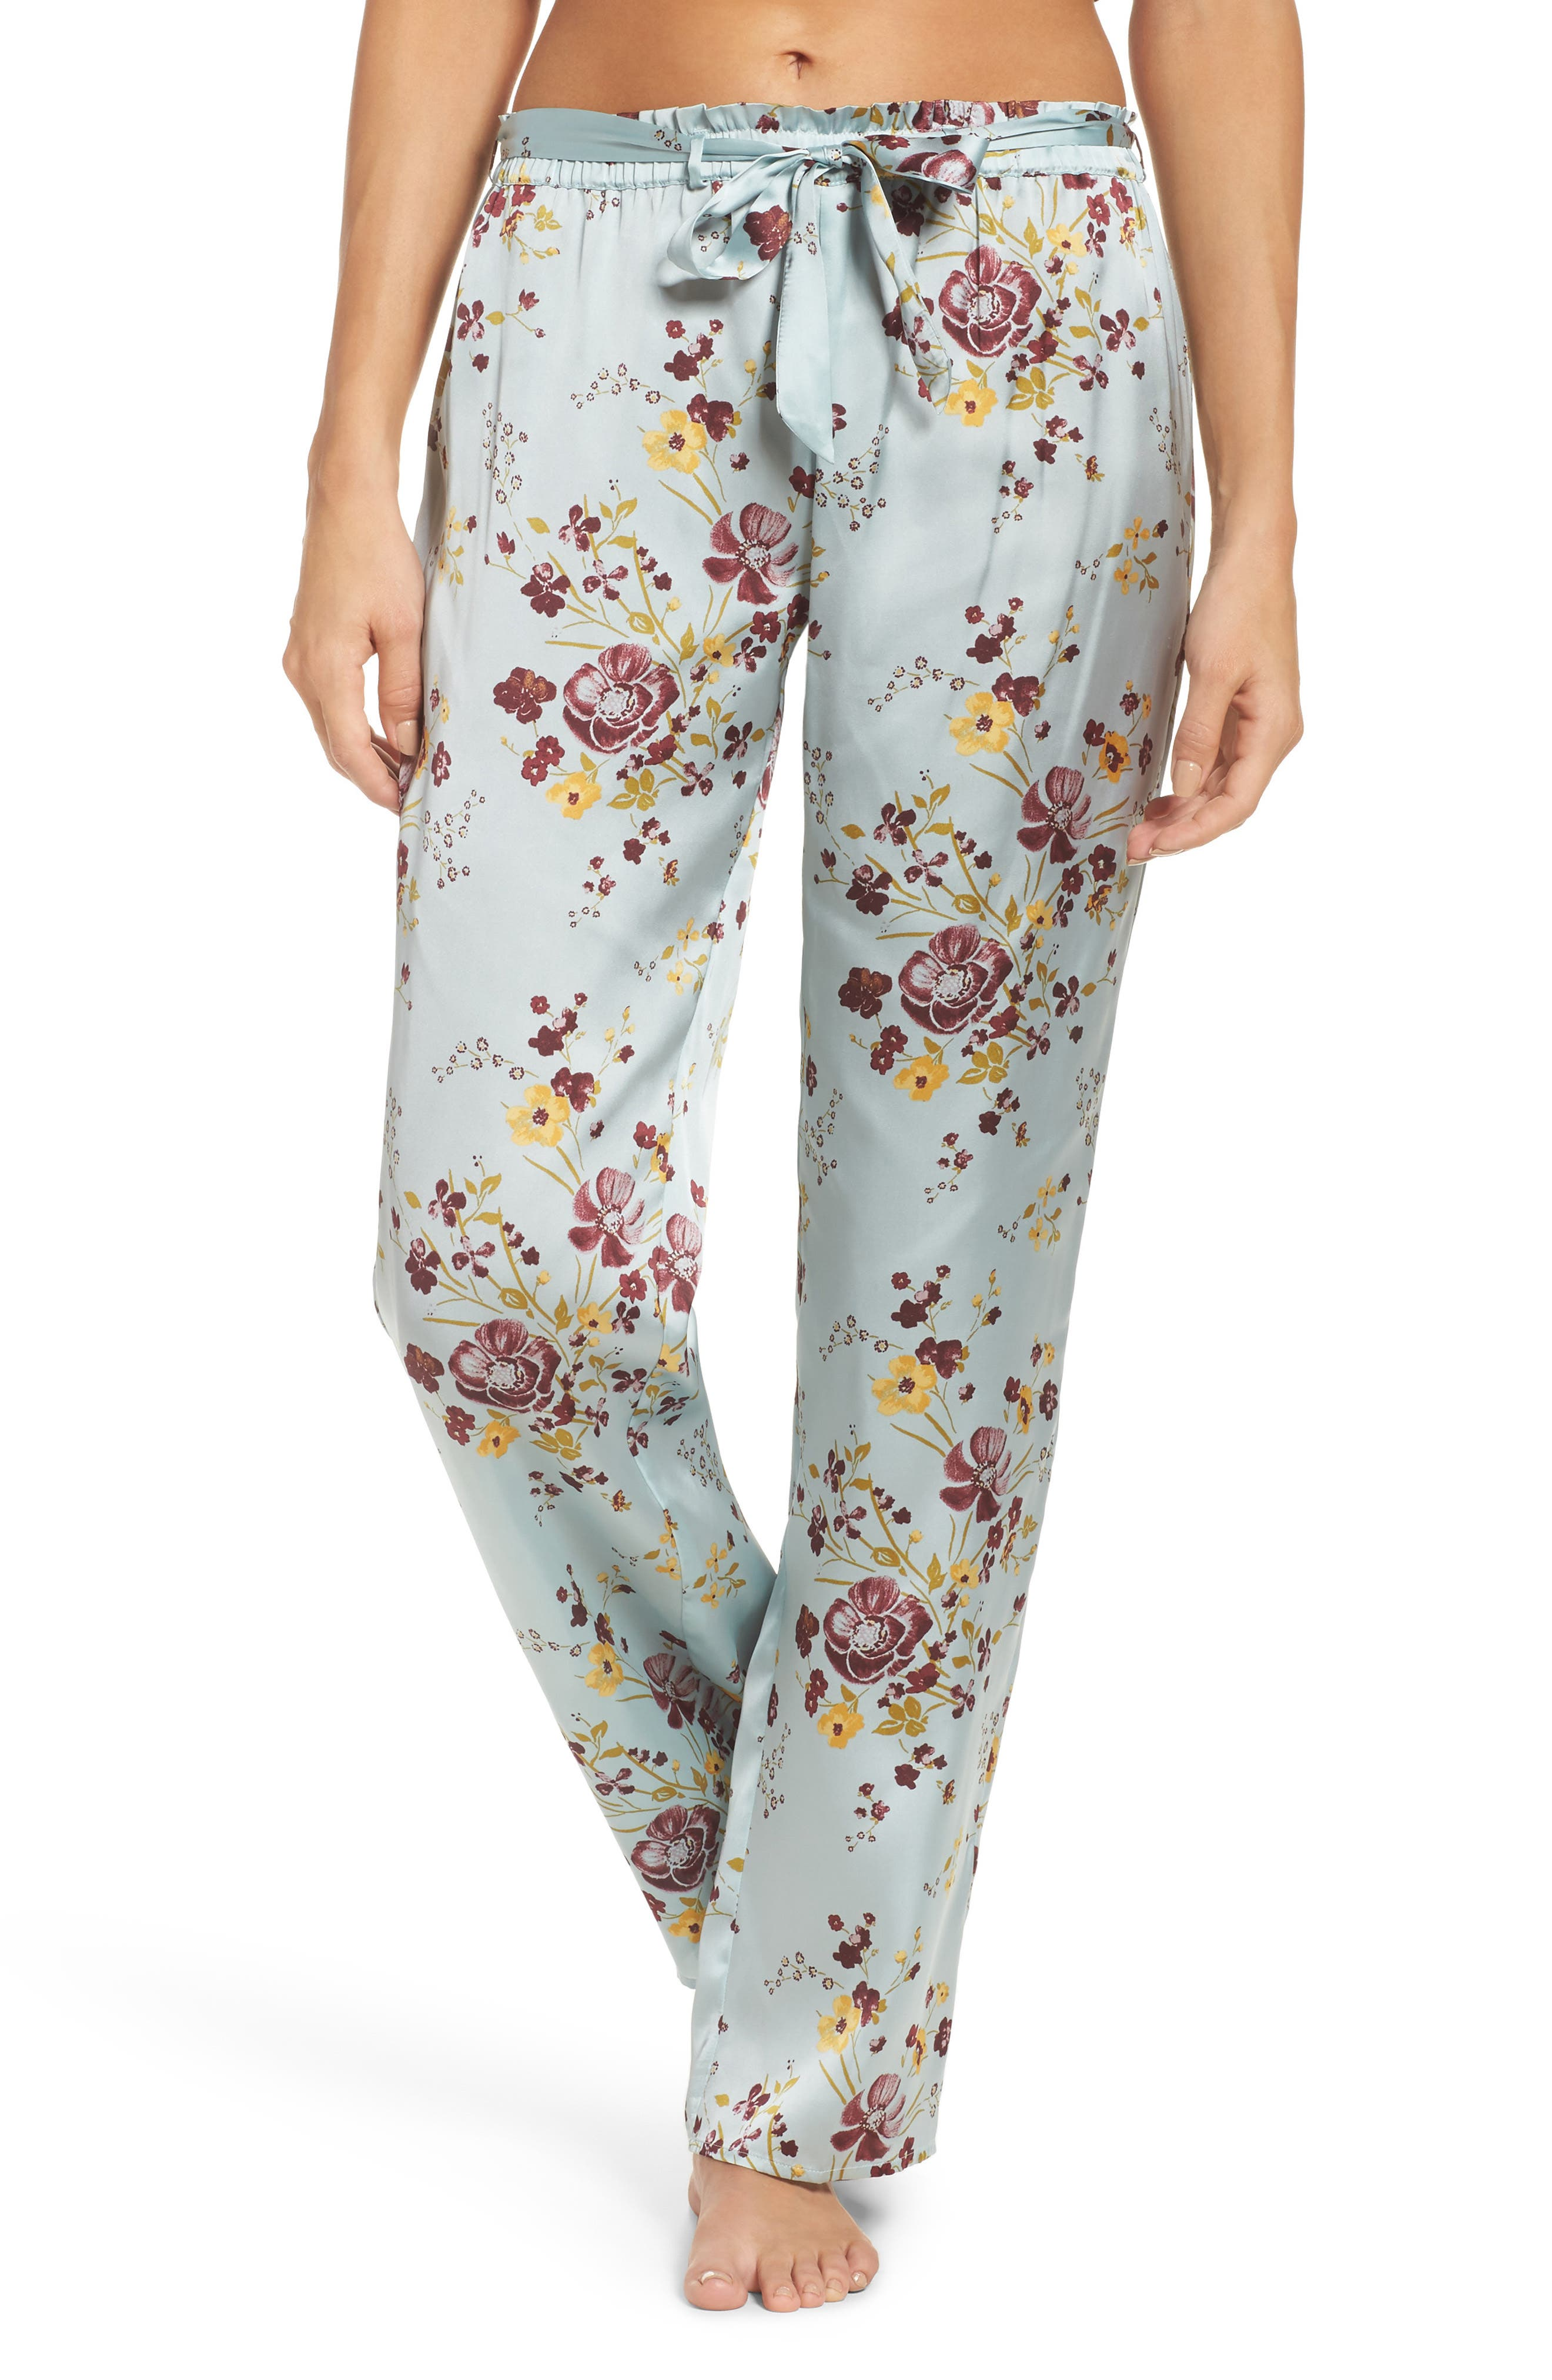 Chelsea28 In My Dreams Pajama Pants